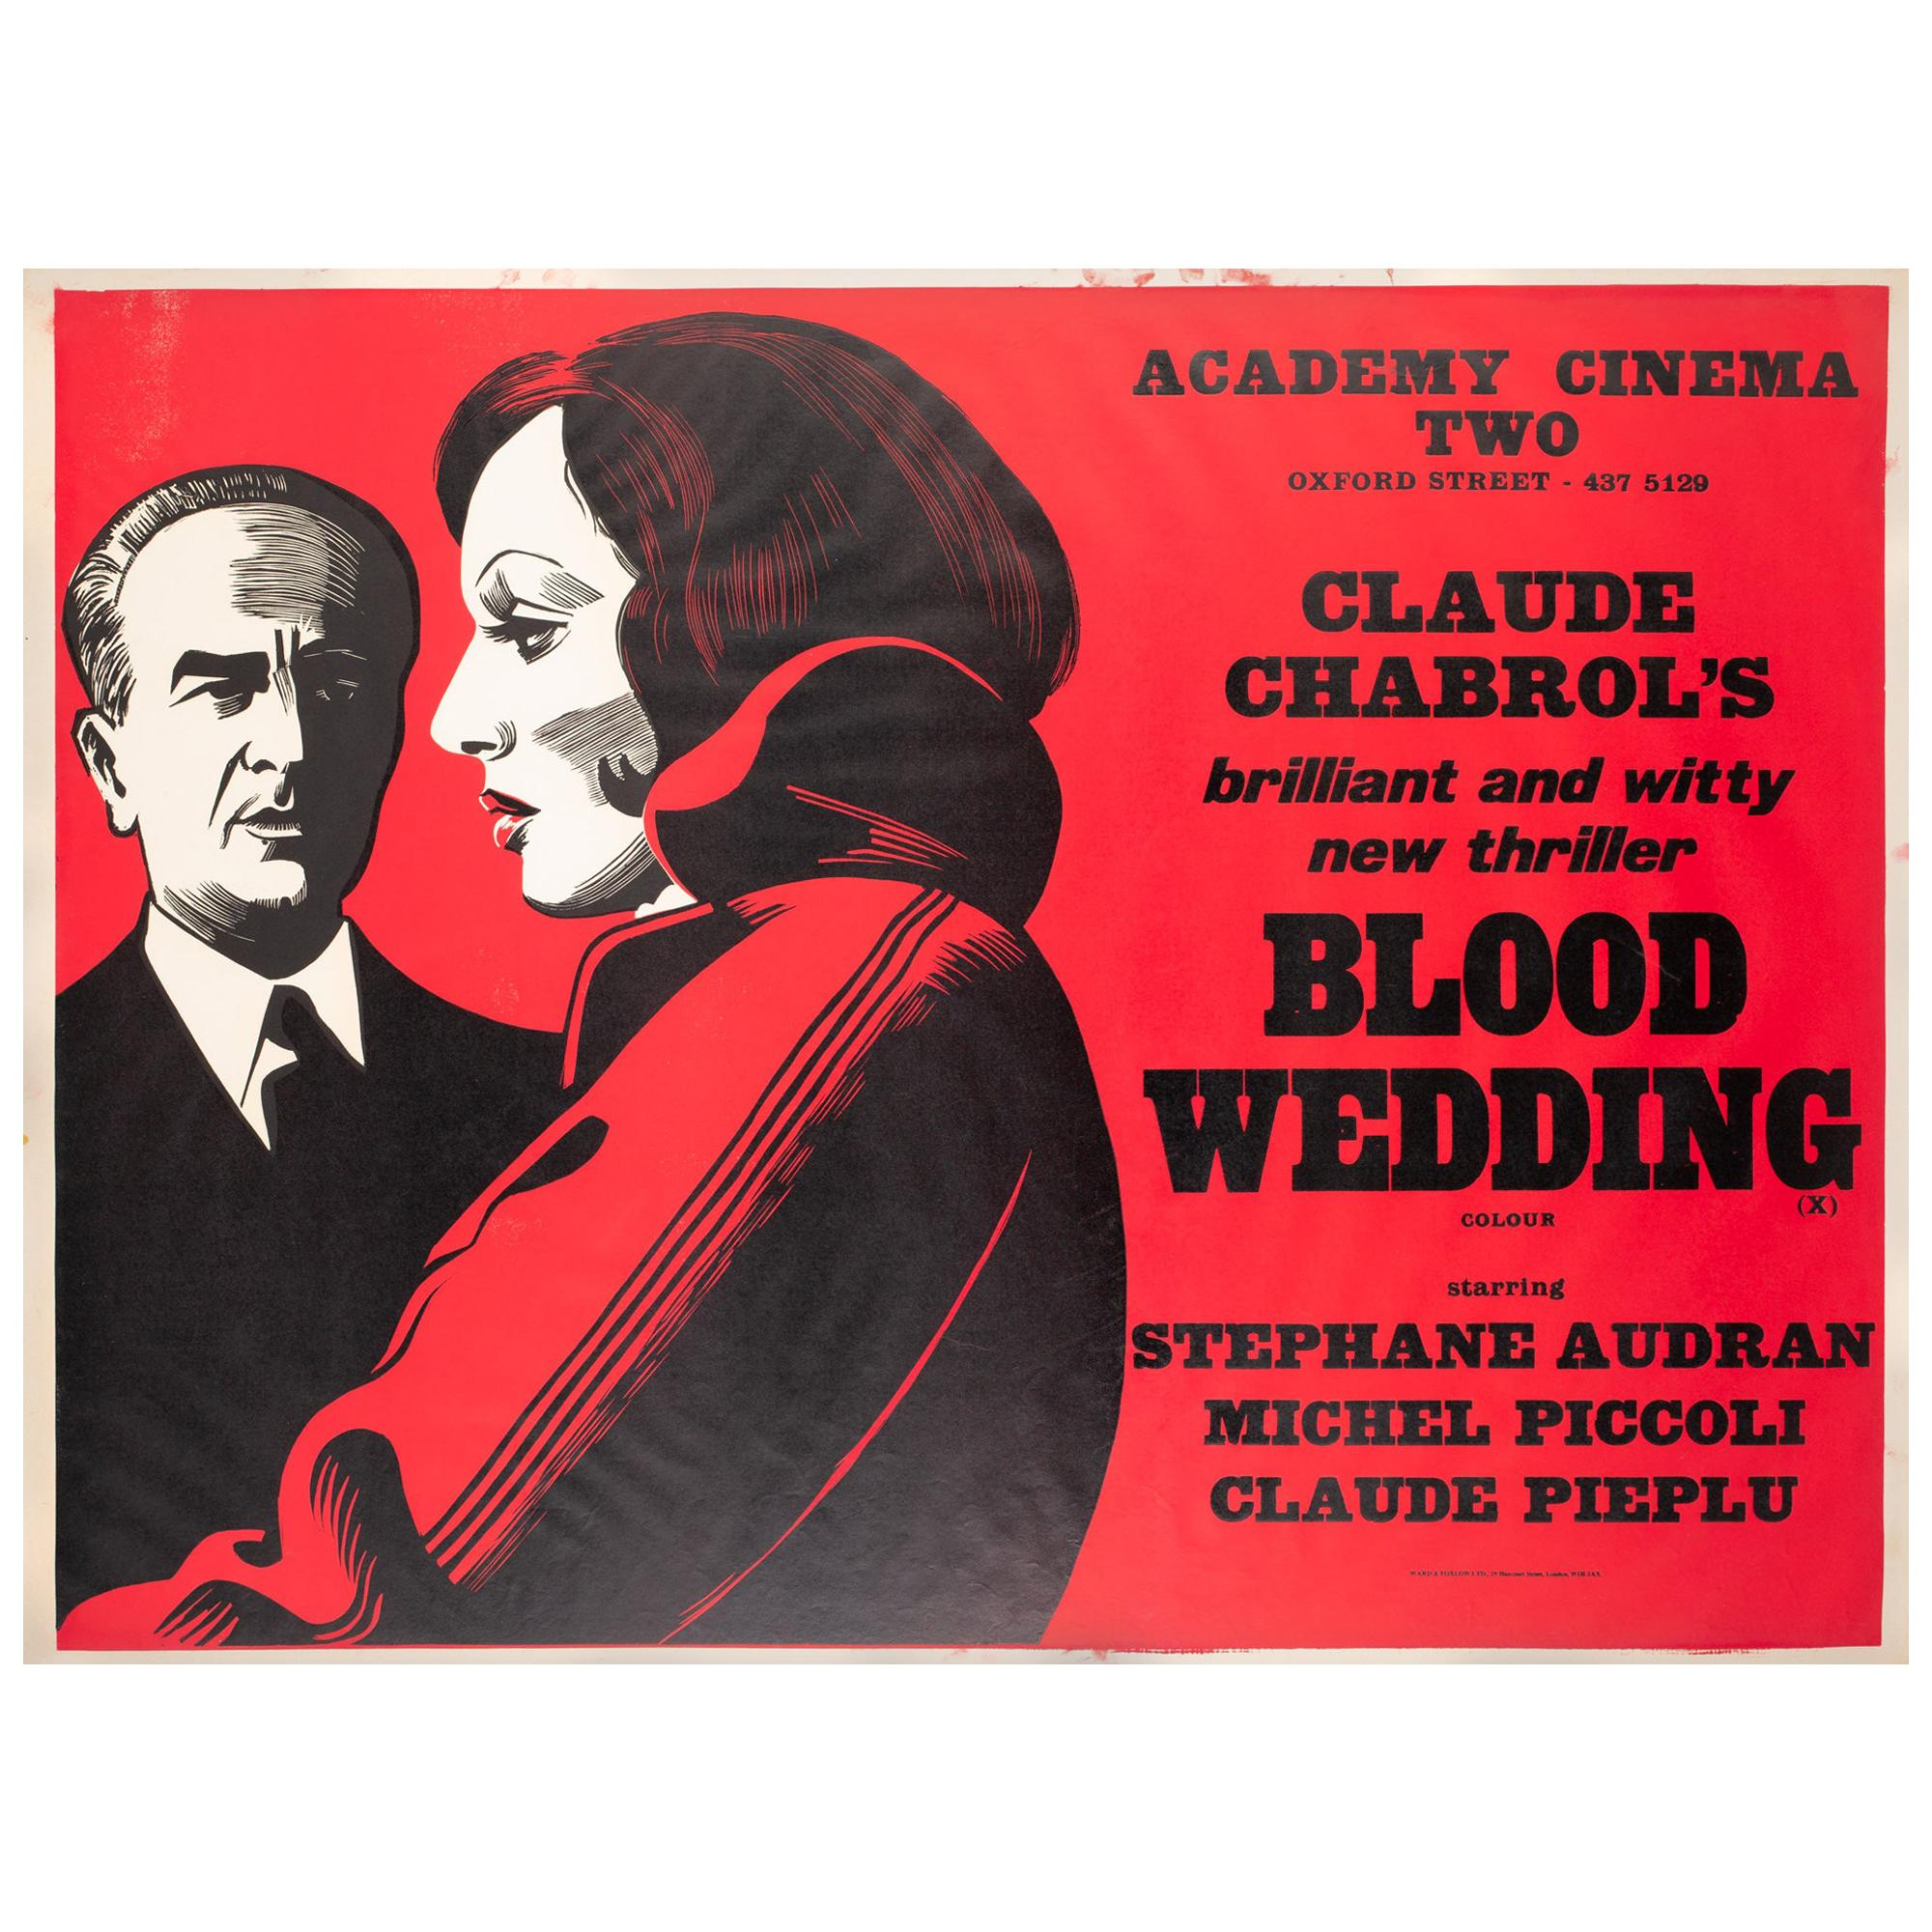 Blood Wedding 1973 Academy Cinema UK Quad Film Poster, Strausfeld